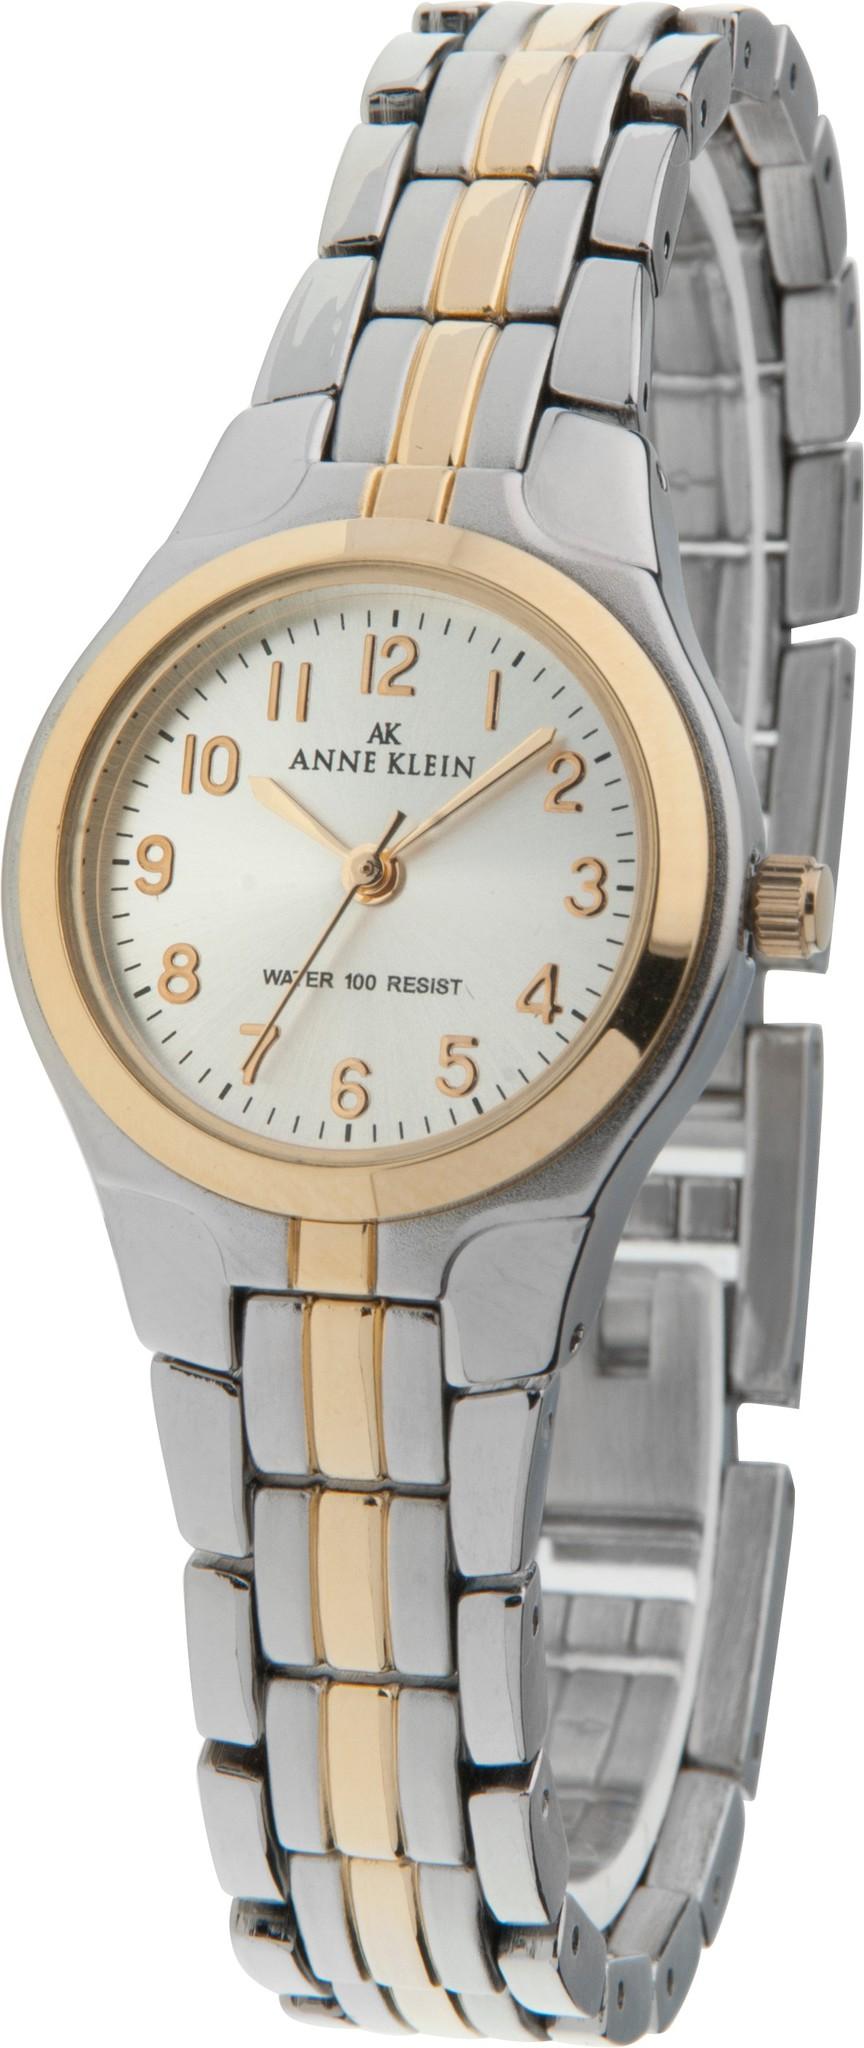 Anne Klein 5491SVTT - женские наручные часы из коллекции DailyAnne Klein<br><br><br>Бренд: Anne Klein<br>Модель: Anne Klein 5491 SVTT<br>Артикул: 5491SVTT<br>Вариант артикула: None<br>Коллекция: Daily<br>Подколлекция: None<br>Страна: США<br>Пол: женские<br>Тип механизма: кварцевые<br>Механизм: Ronda 775<br>Количество камней: None<br>Автоподзавод: None<br>Источник энергии: None<br>Срок службы элемента питания: None<br>Дисплей: стрелки<br>Цифры: арабские<br>Водозащита: None<br>Противоударные: None<br>Материал корпуса: нерж. сталь<br>Материал браслета: не указан<br>Материал безеля: None<br>Стекло: минеральное<br>Антибликовое покрытие: None<br>Цвет корпуса: None<br>Цвет браслета: None<br>Цвет циферблата: None<br>Цвет безеля: None<br>Размеры: None<br>Диаметр: None<br>Диаметр корпуса: None<br>Толщина: None<br>Ширина ремешка: None<br>Вес: None<br>Спорт-функции: None<br>Подсветка: None<br>Вставка: None<br>Отображение даты: число<br>Хронограф: None<br>Таймер: None<br>Термометр: None<br>Хронометр: None<br>GPS: None<br>Радиосинхронизация: None<br>Барометр: None<br>Скелетон: None<br>Дополнительная информация: None<br>Дополнительные функции: None